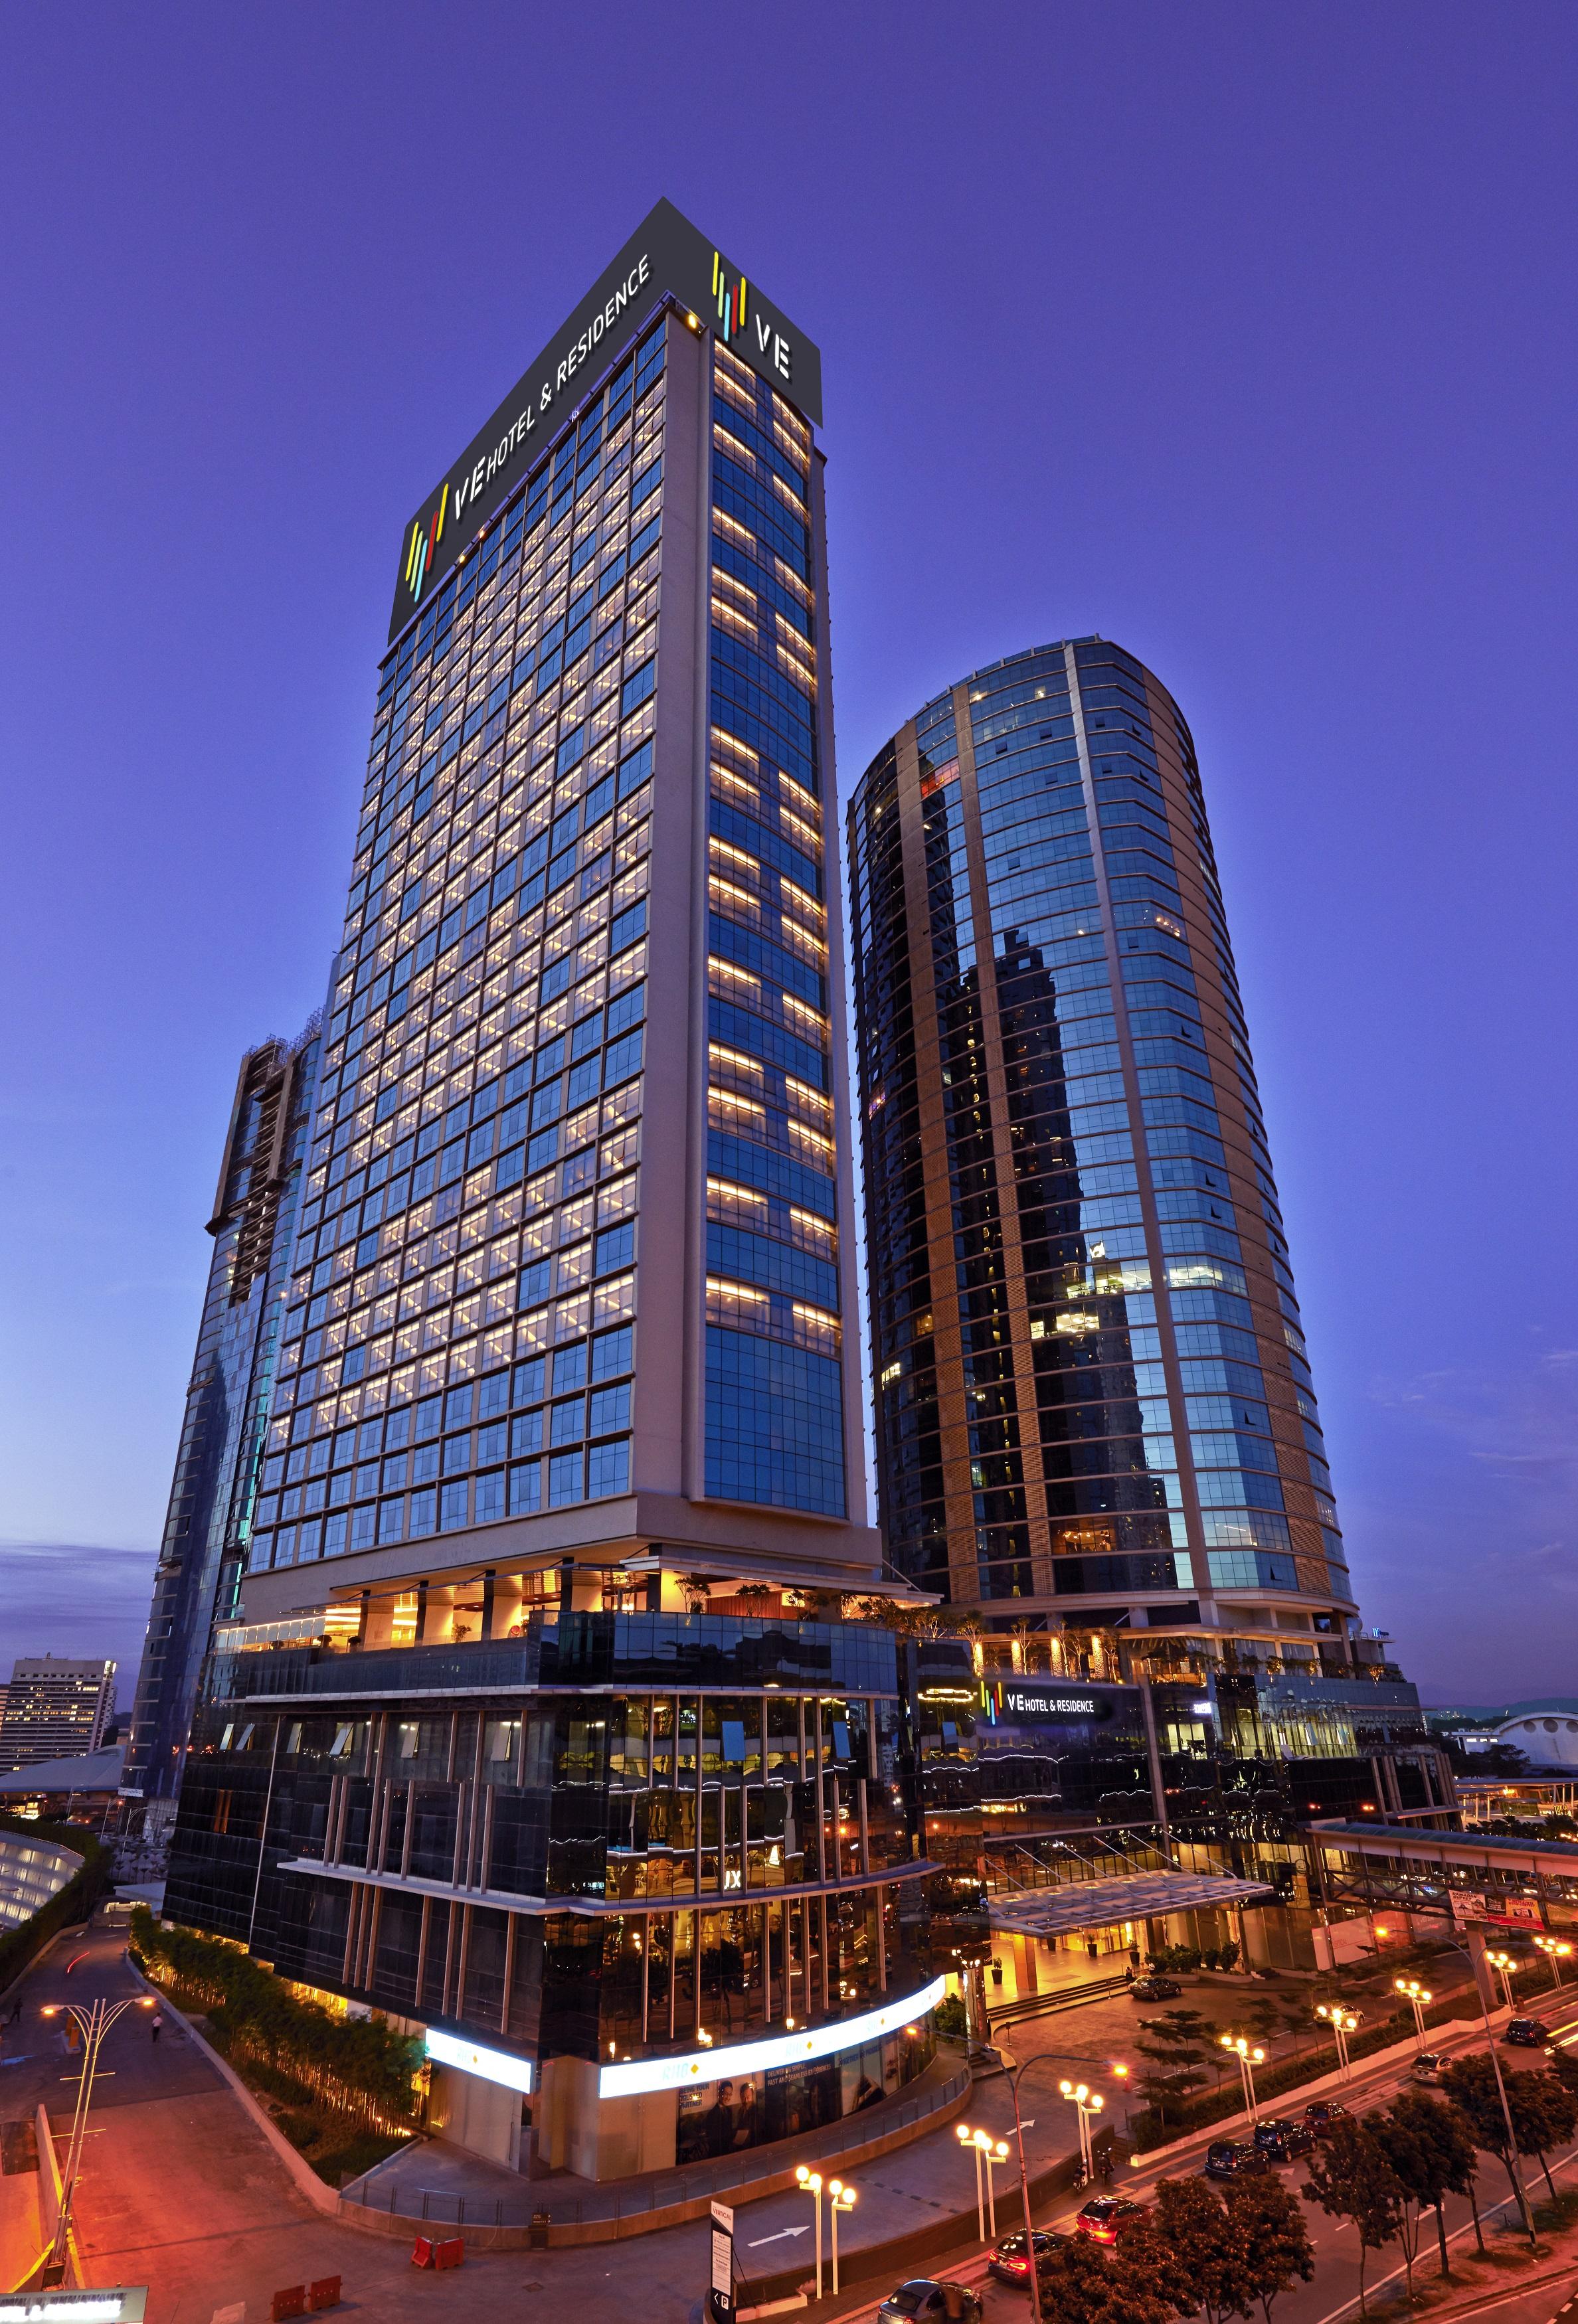 V E Hotel & Residence, Kuala Lumpur